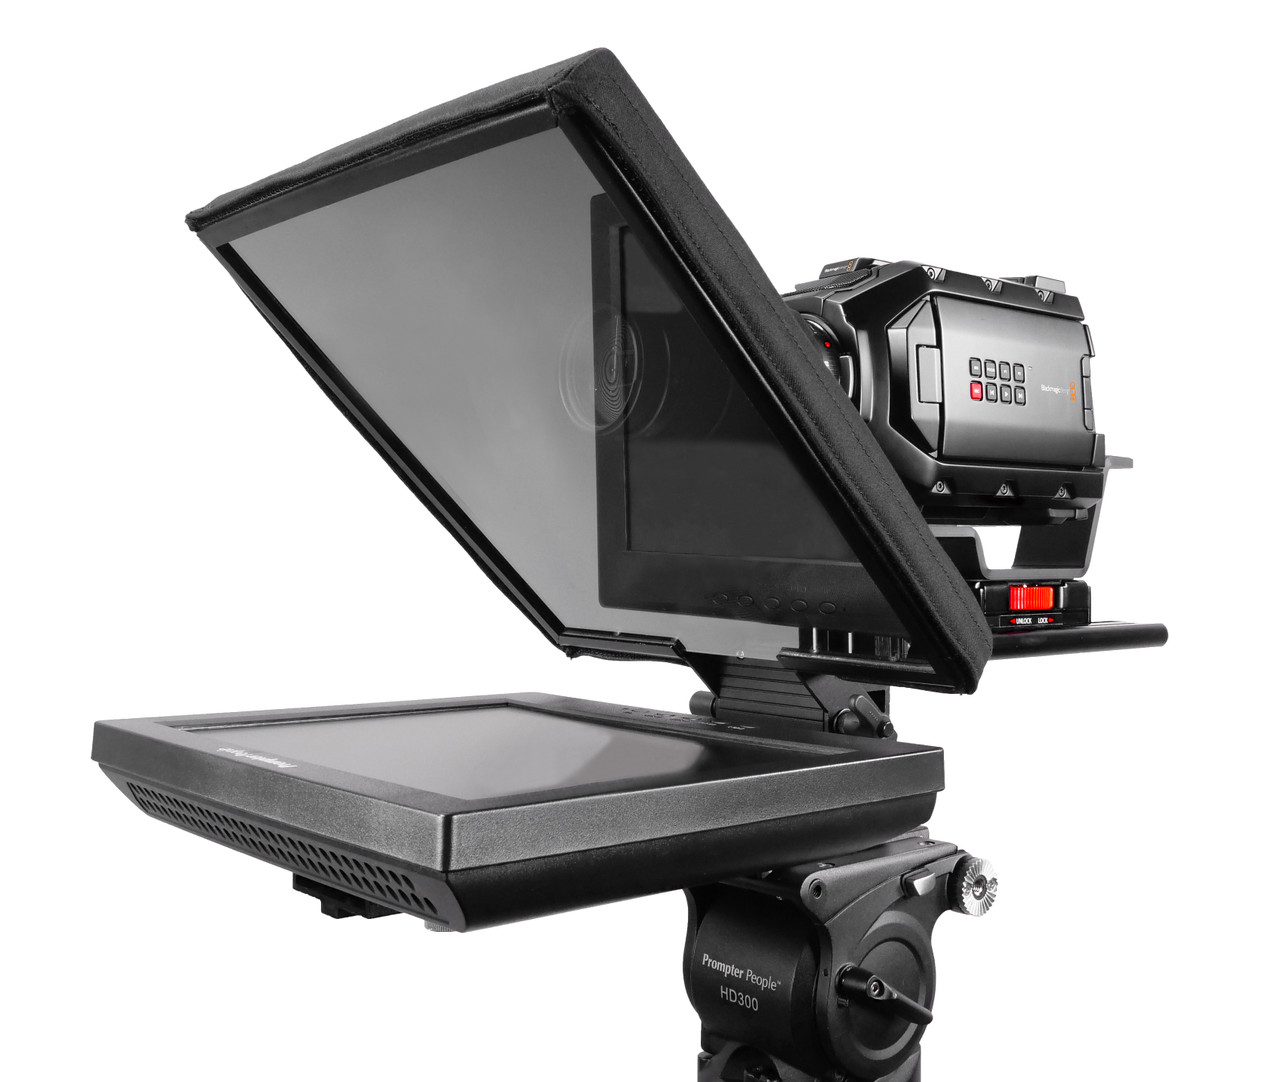 "UltraFlex 12 Inch iPad Pro, Regular Monitor, and HighBright Monitor - Pictured with HighBright 12"" Monitor - Angled"